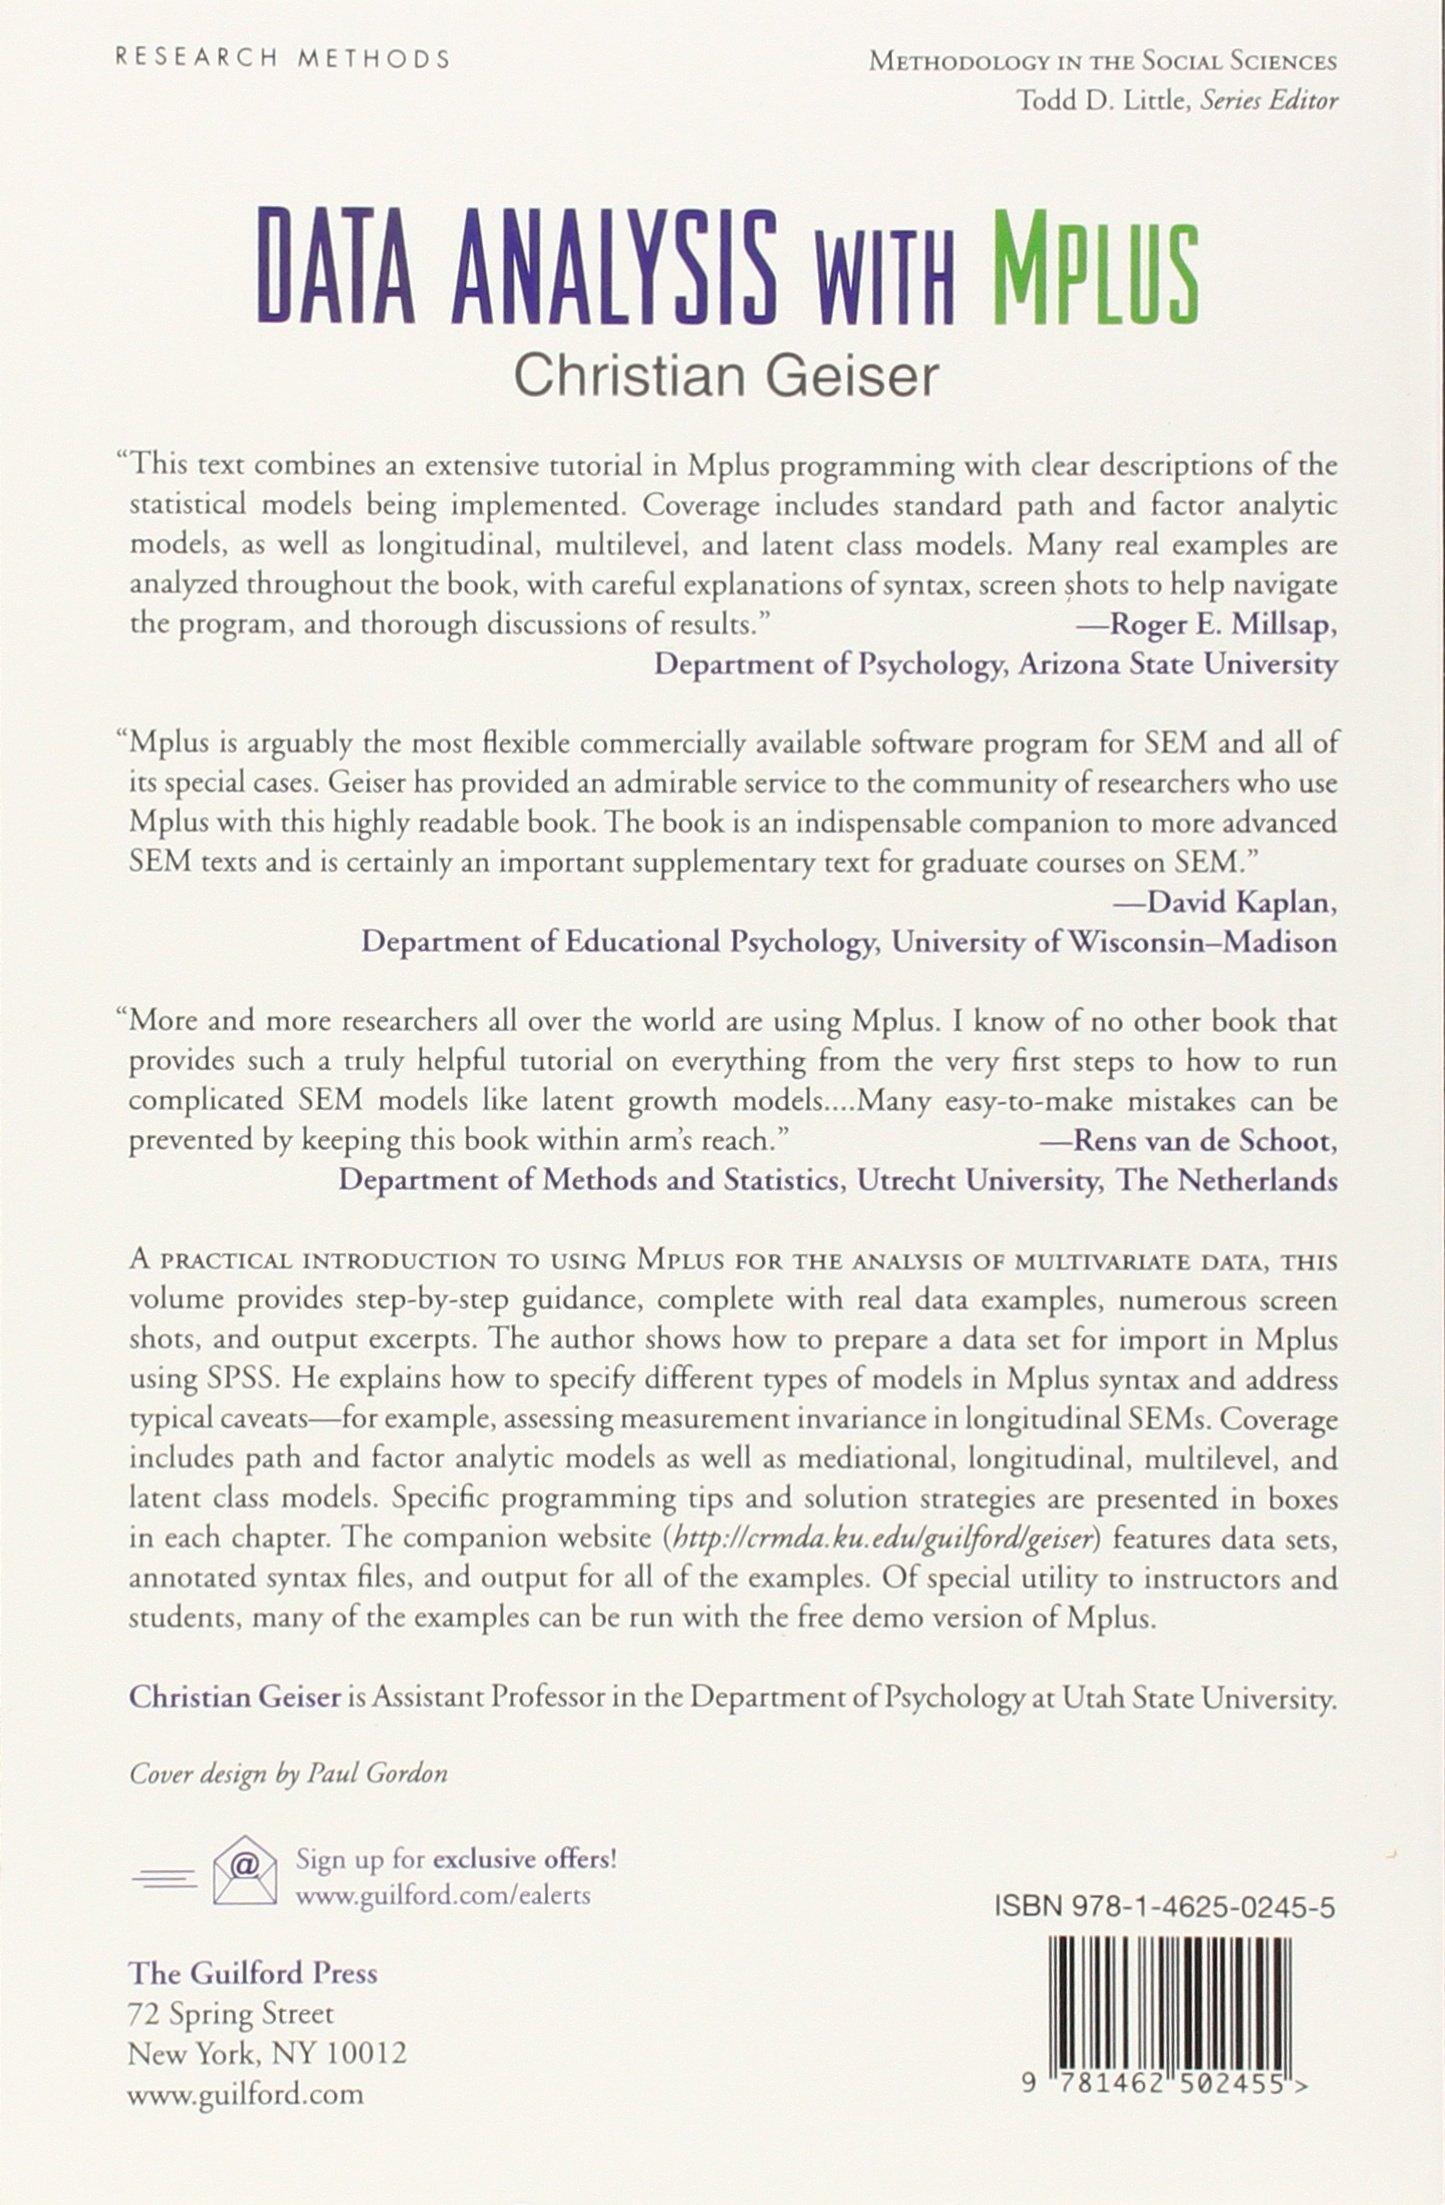 Data Analysis with Mplus Methodology in the Social Sciences: Amazon.de:  Christian Geiser: Fremdsprachige Bücher